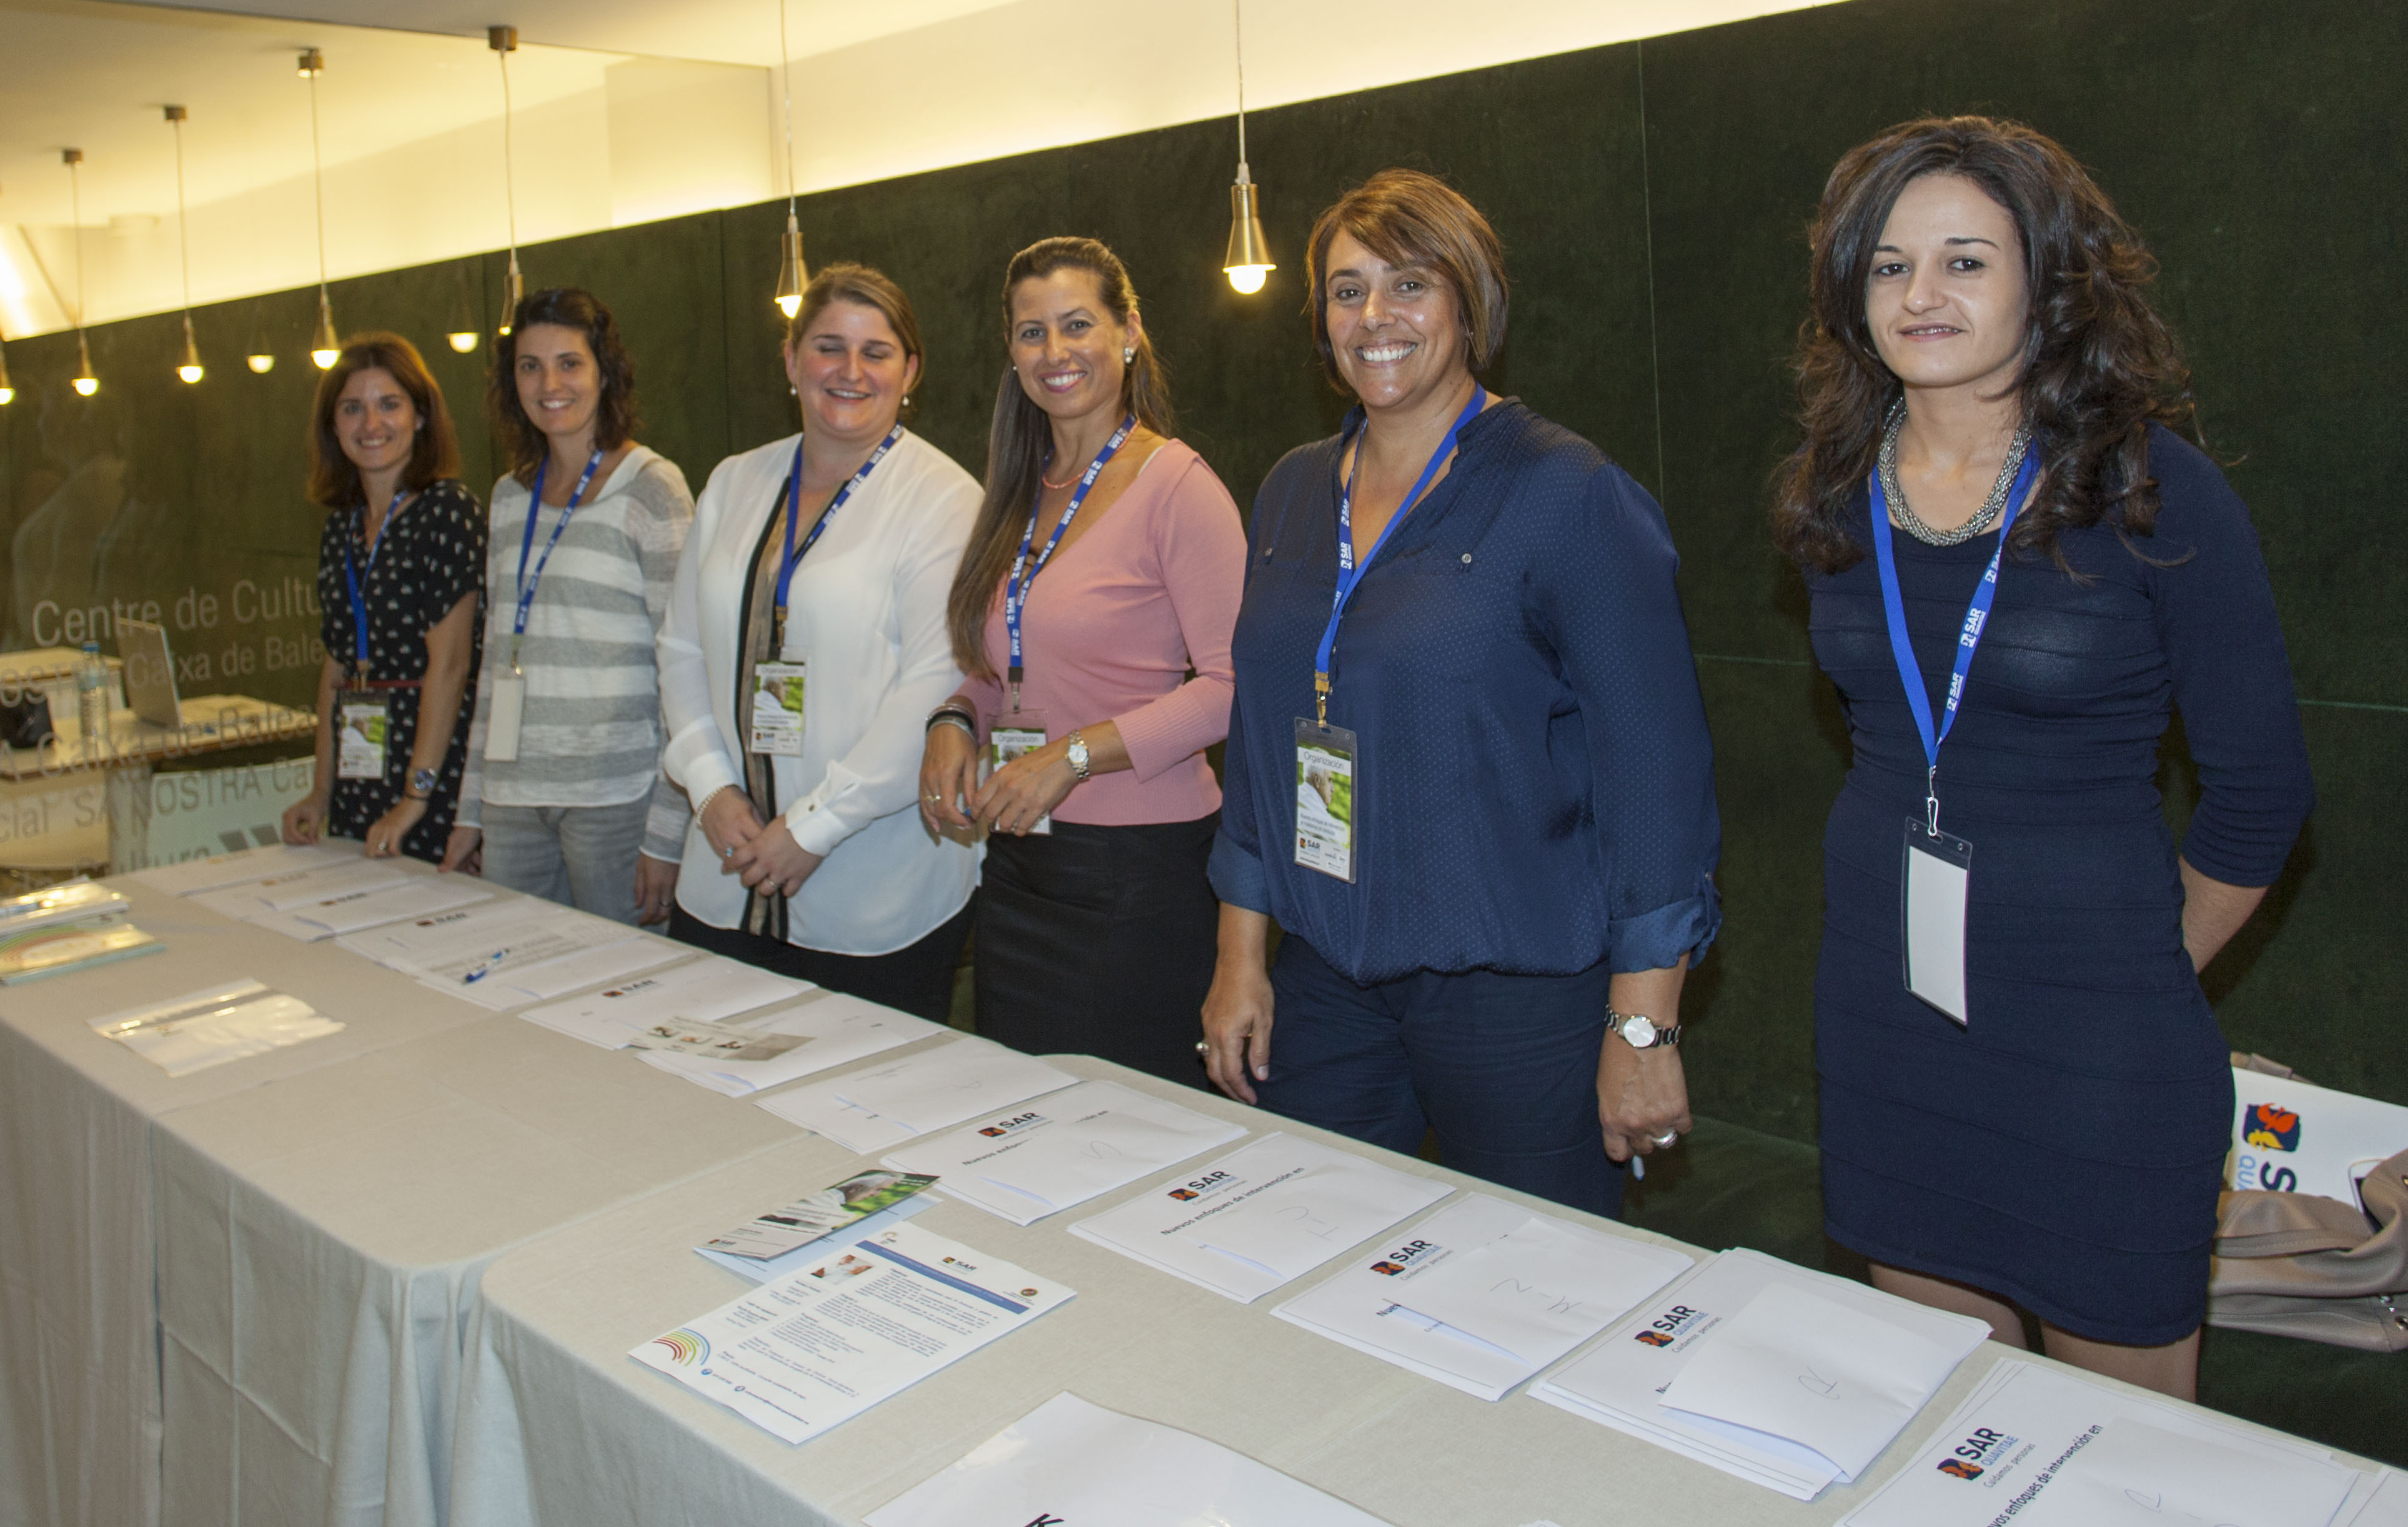 14-10-2014 Jornada SarQuavitae Palma de Mallorca 21